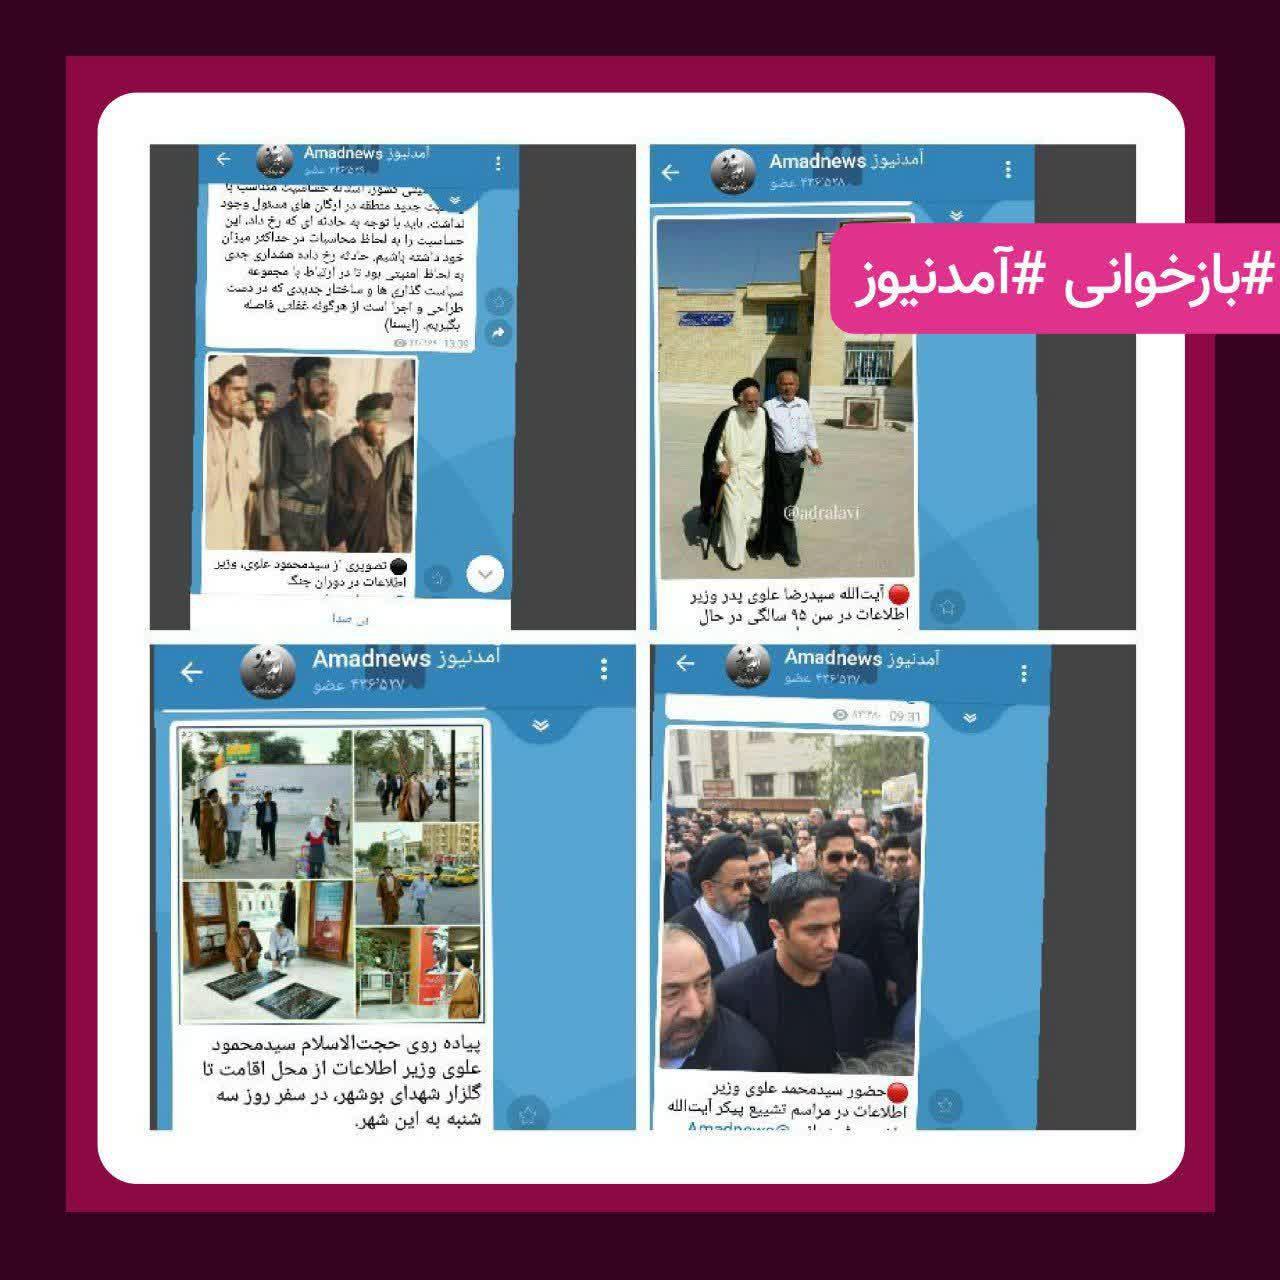 http://dl-abbasi.ir/yekta/1398/Graphic/Amadnews/amadnews%20(12).jpg